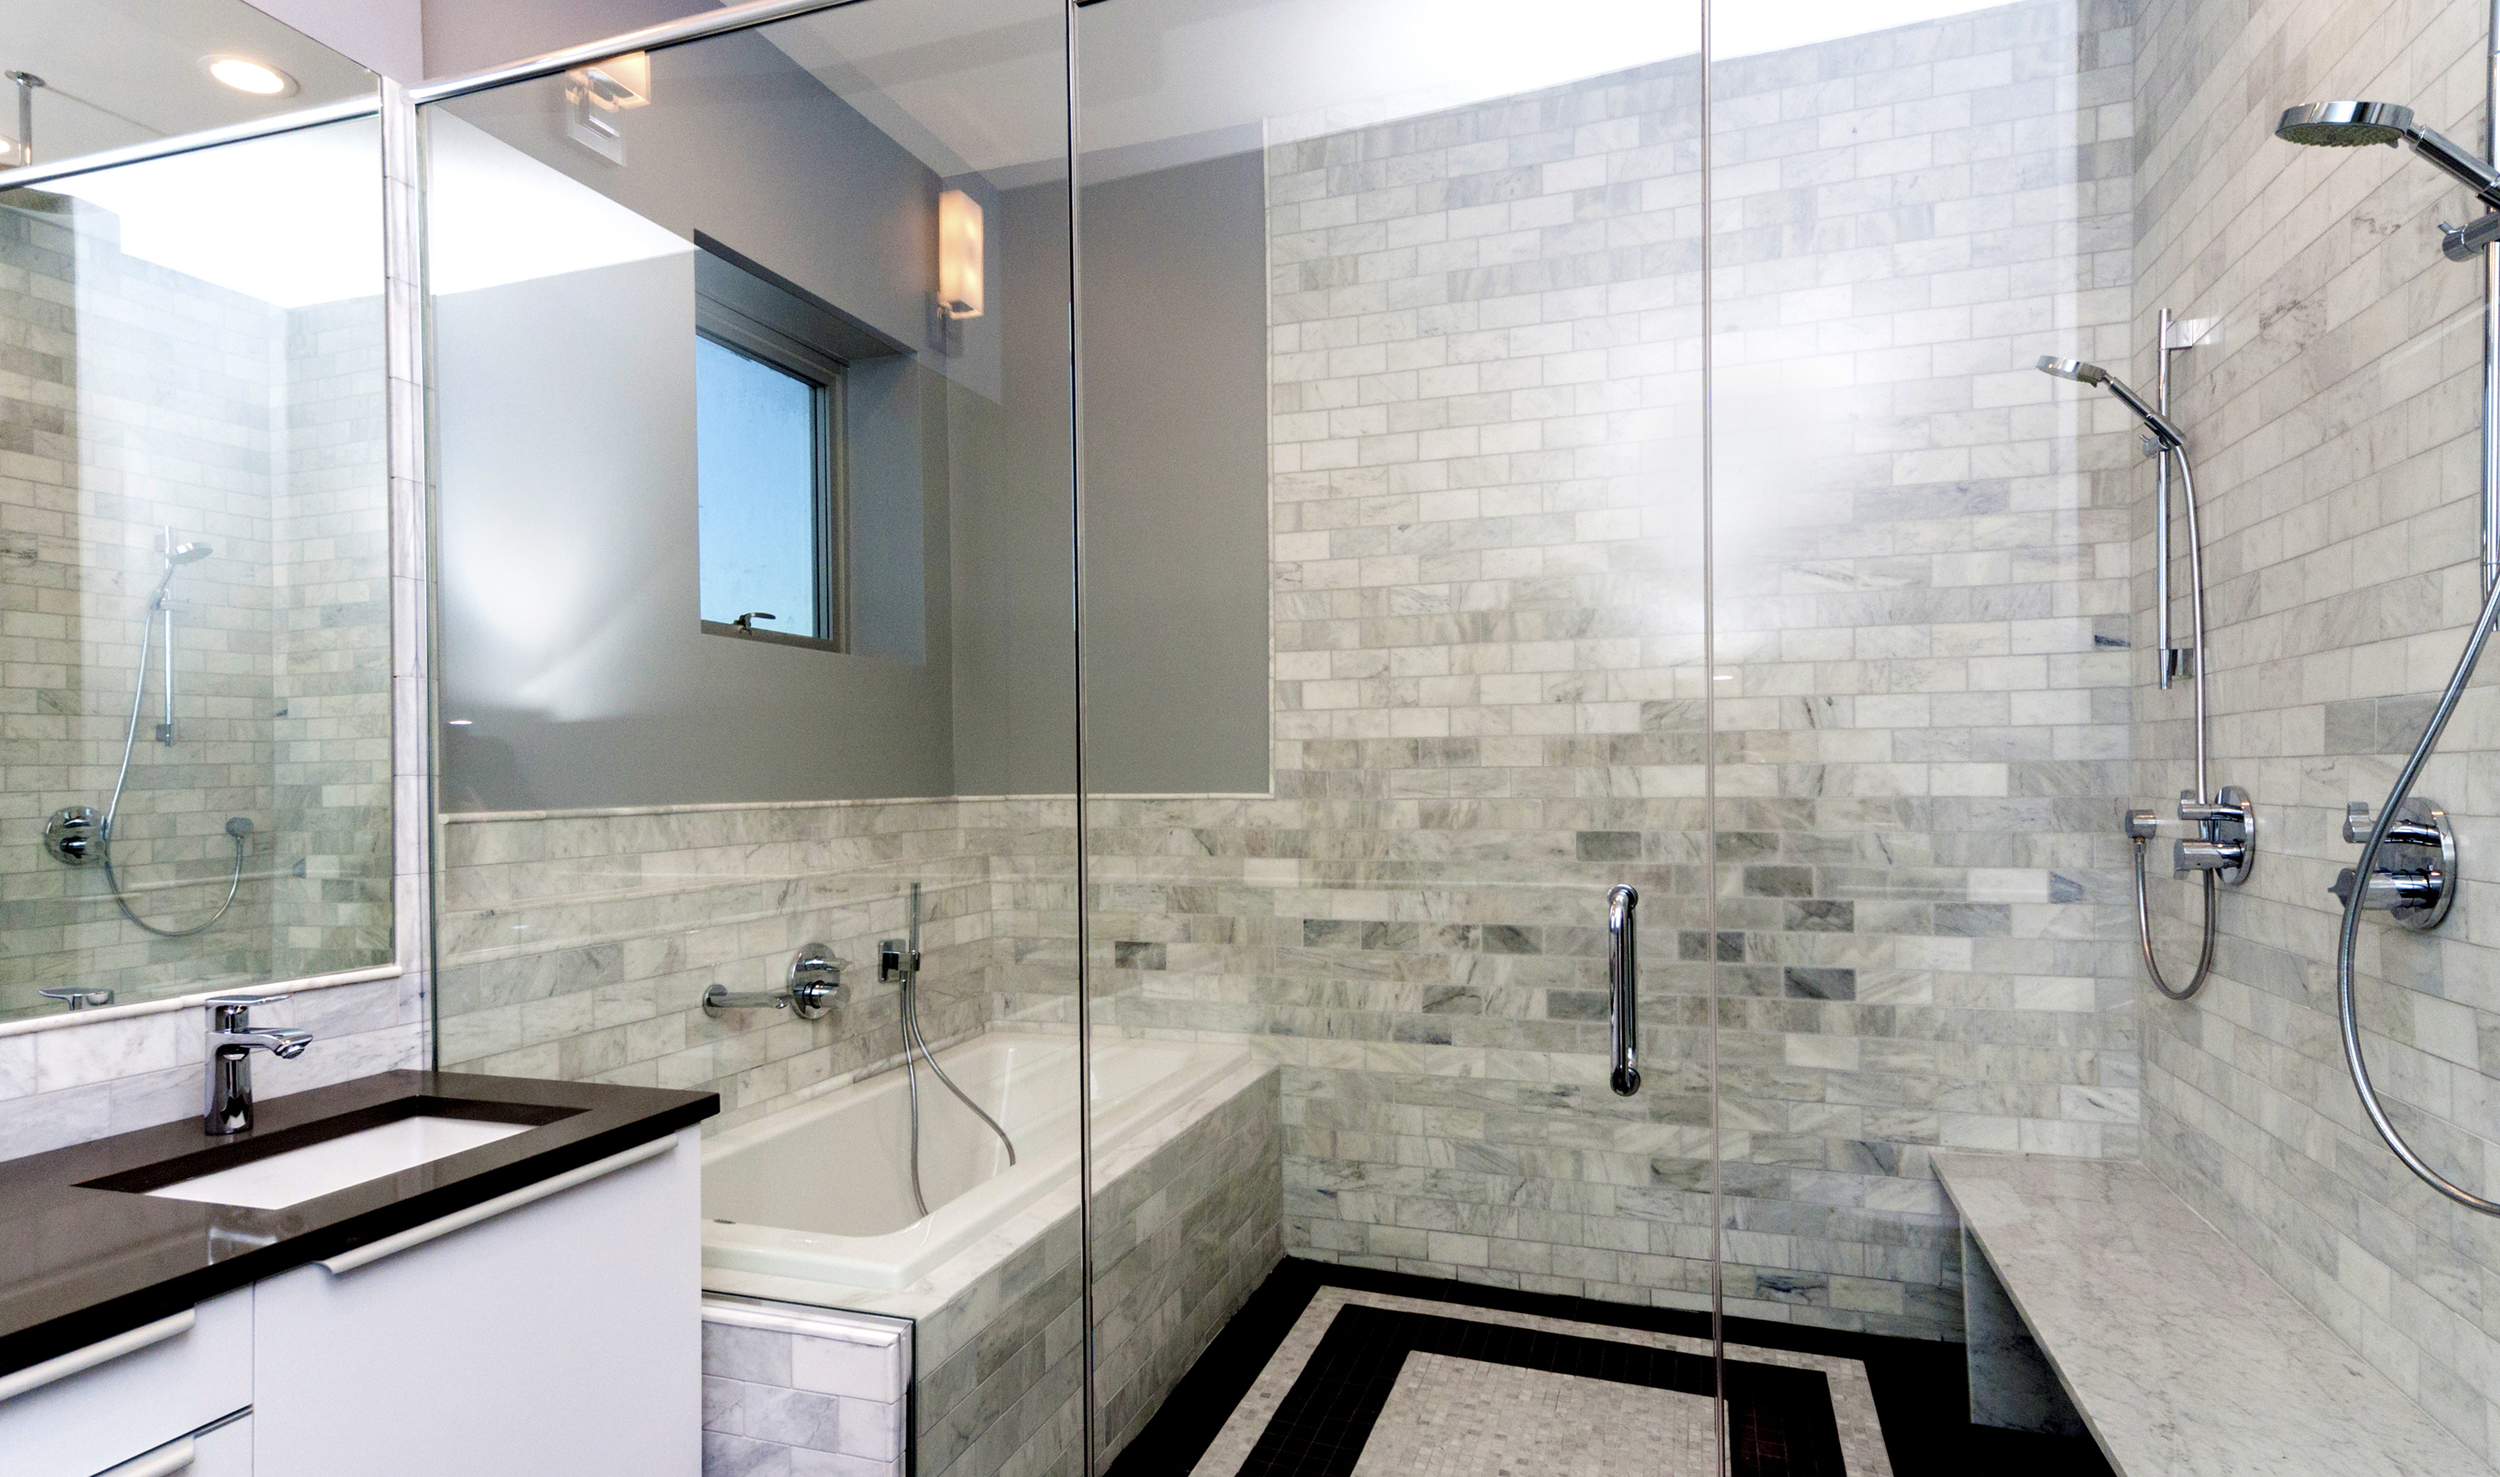 1000 North Damen Chicago Illinois Interior Bathroom TARIS Real Estate